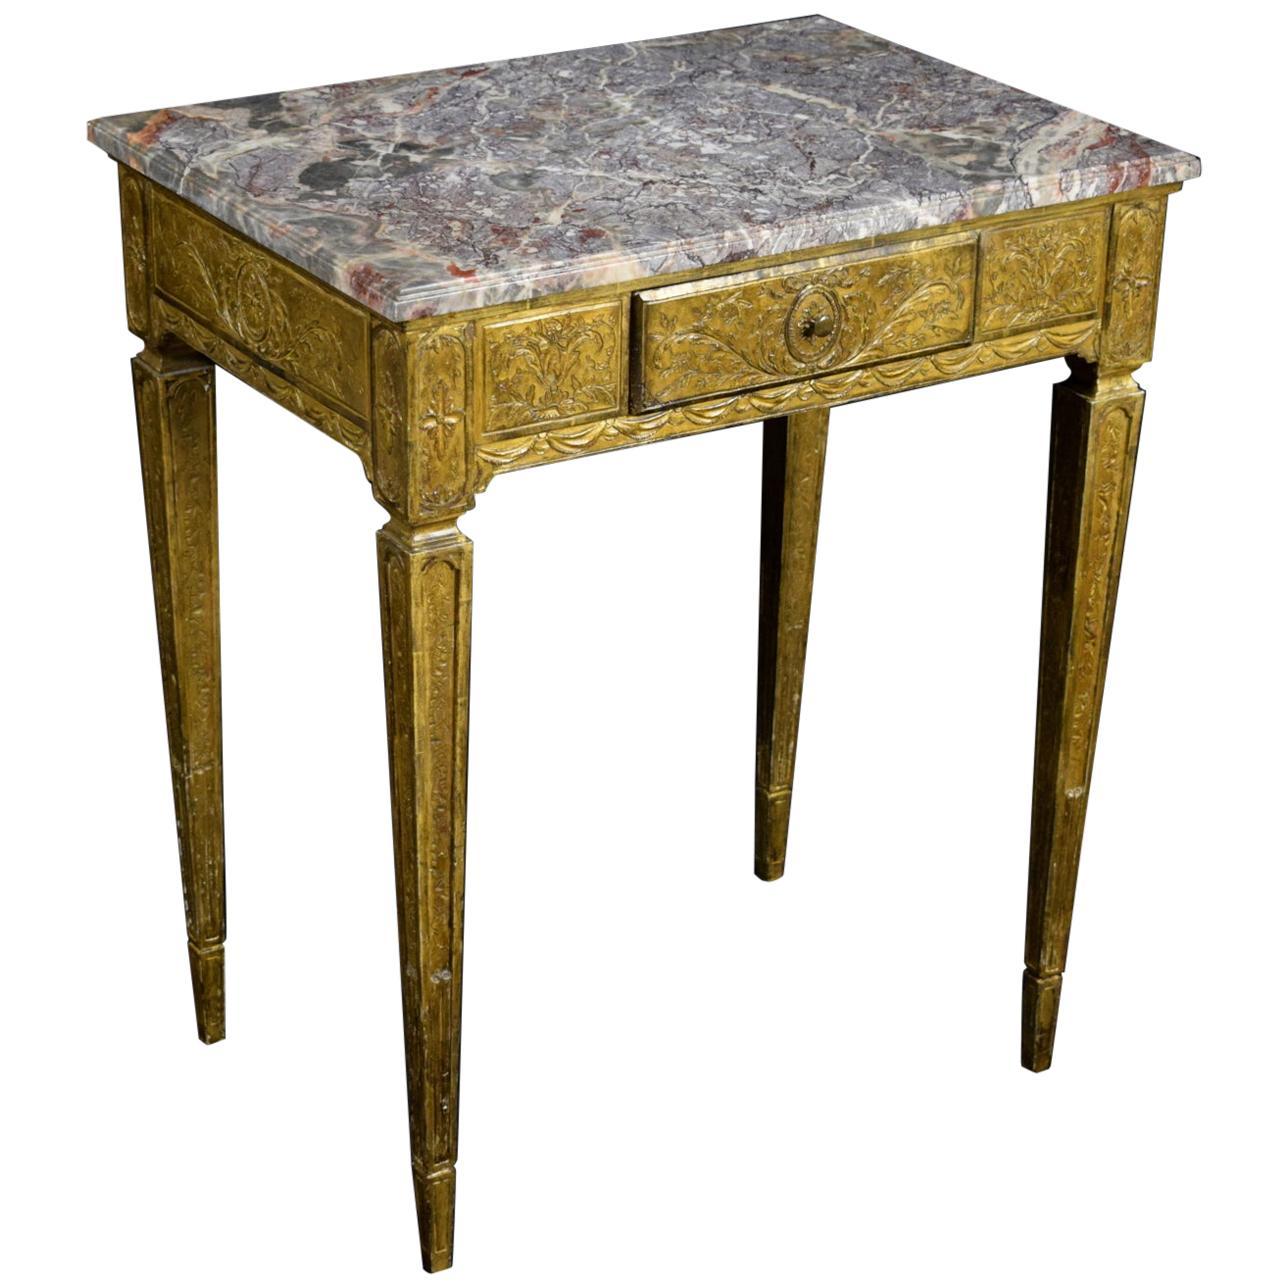 18th Century Louis XVI Giltwood Center Table